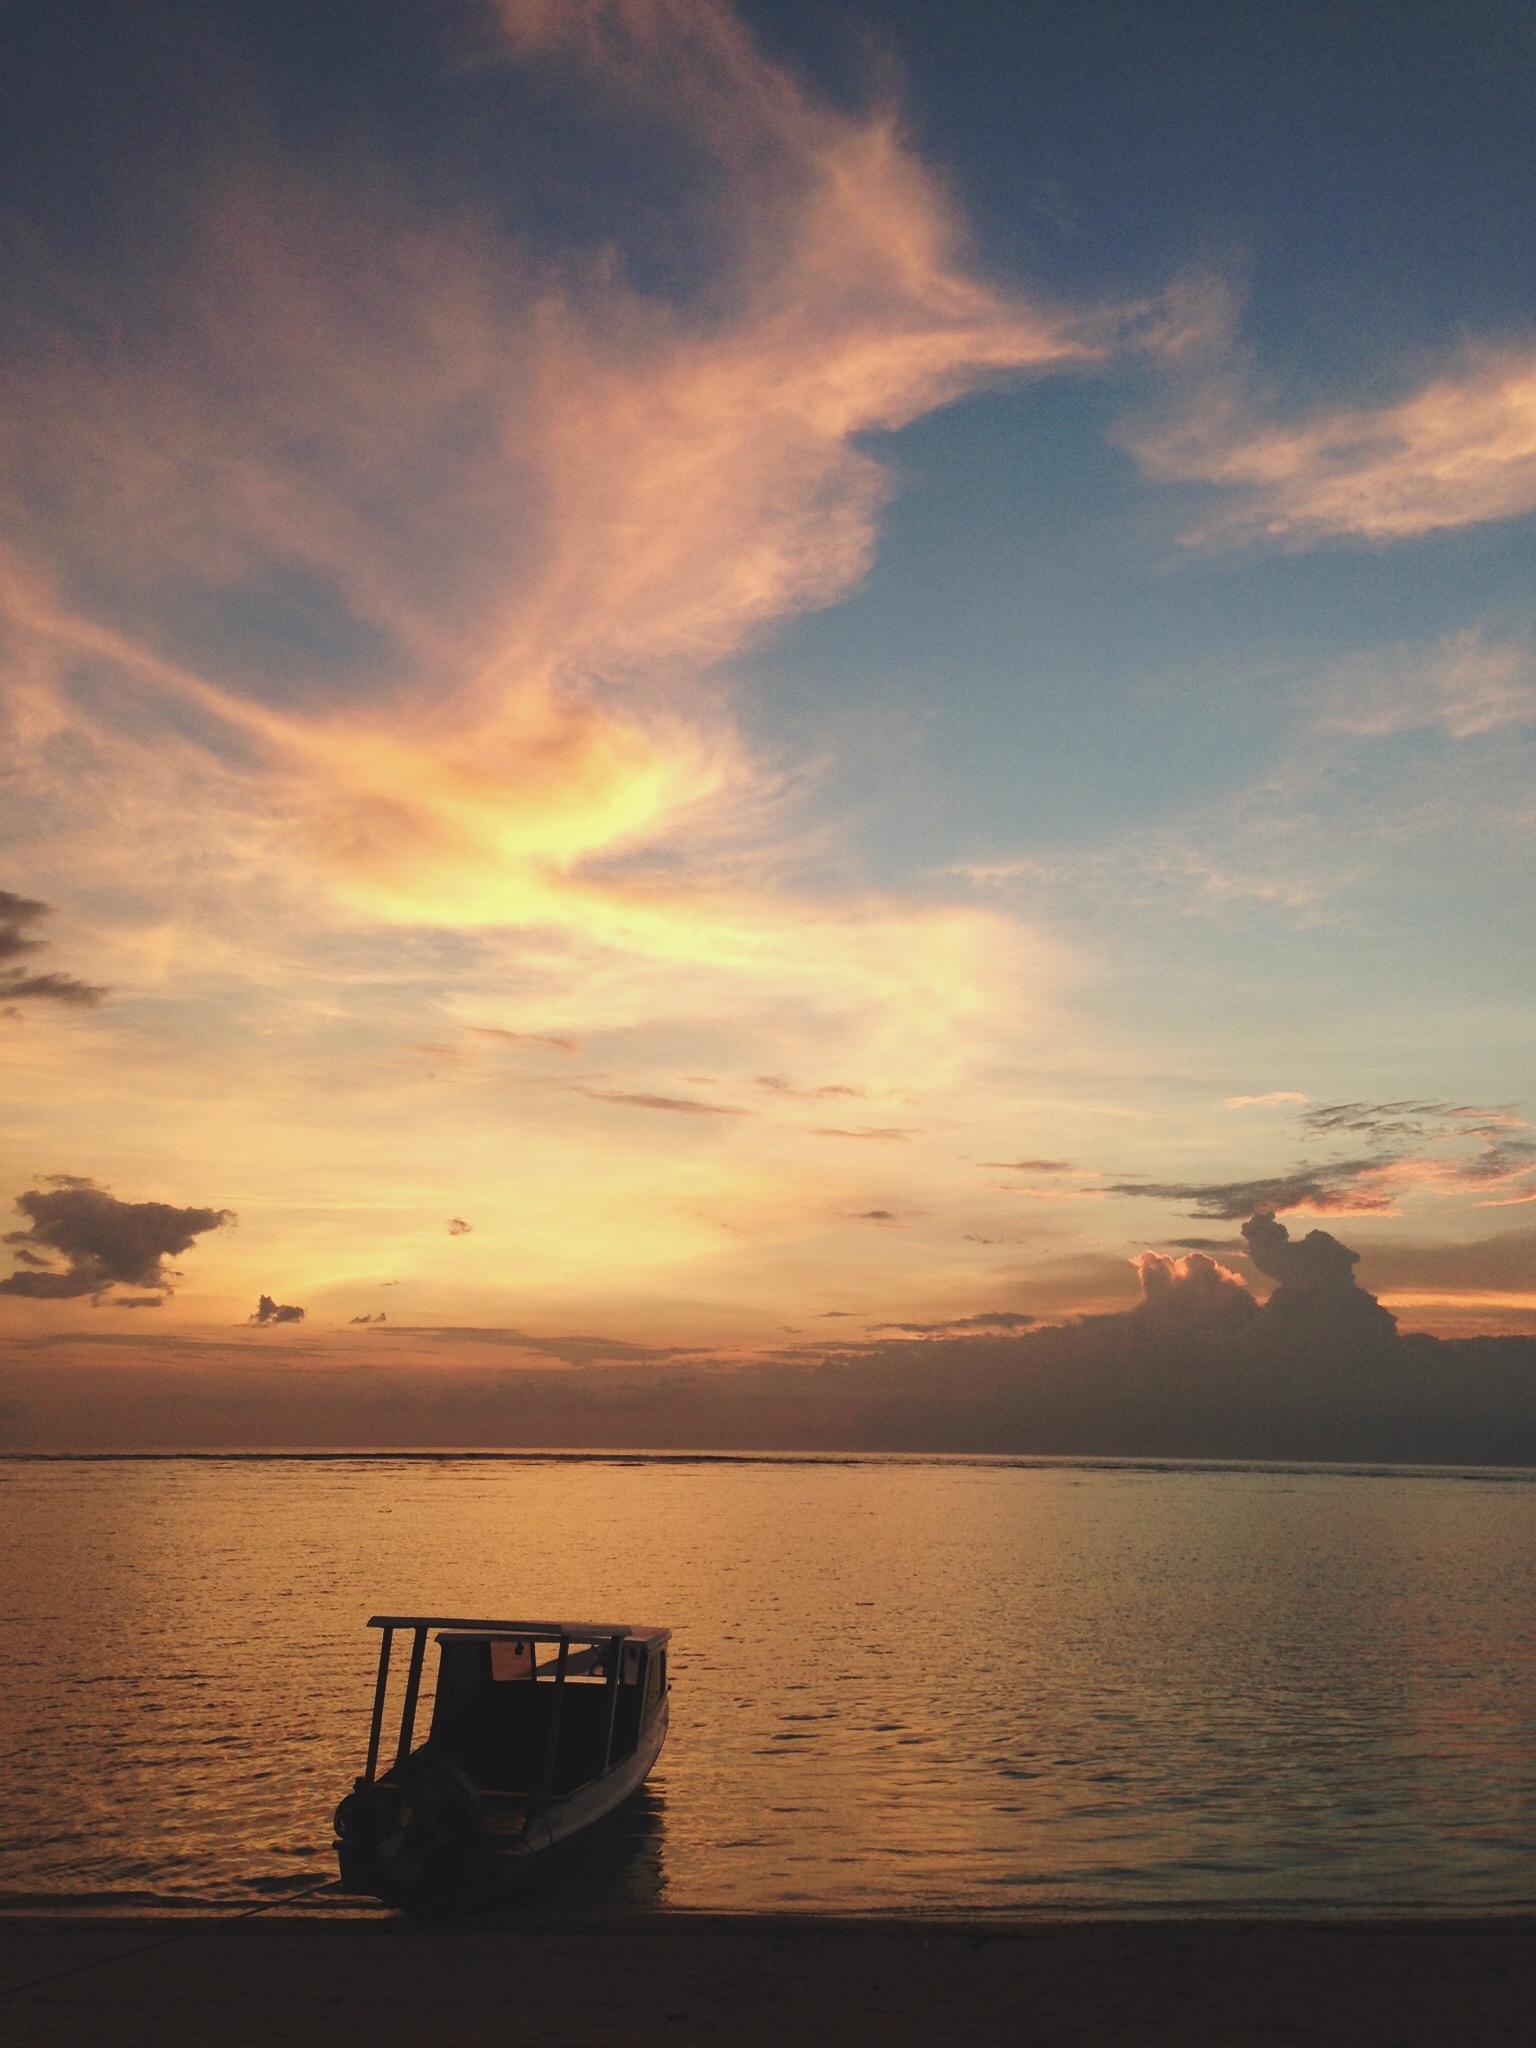 sunset-plage-gili-air.JPG